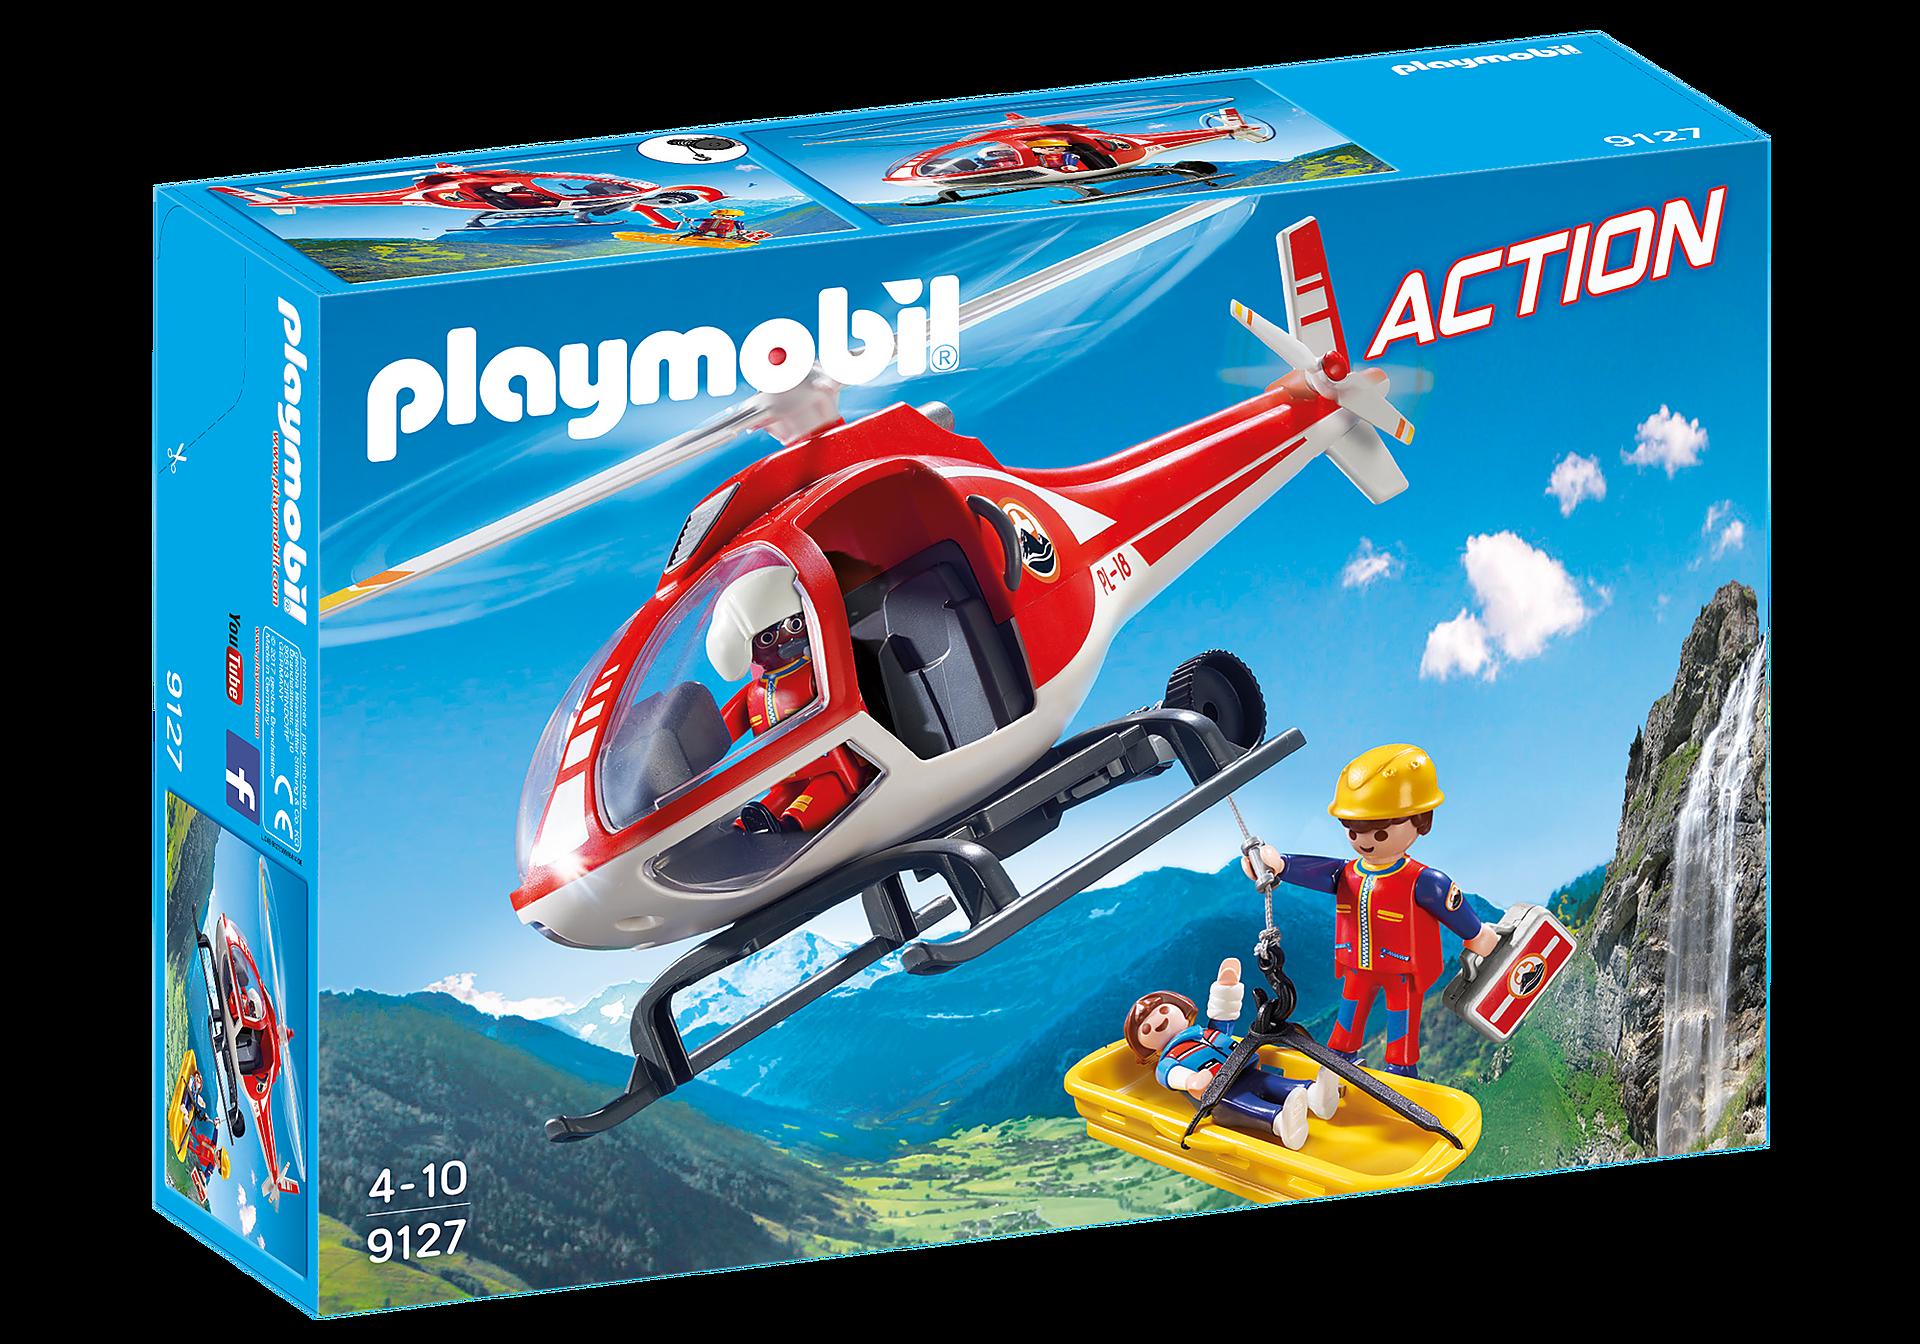 http://media.playmobil.com/i/playmobil/9127_product_box_front/Reddingswerkers met helikopter